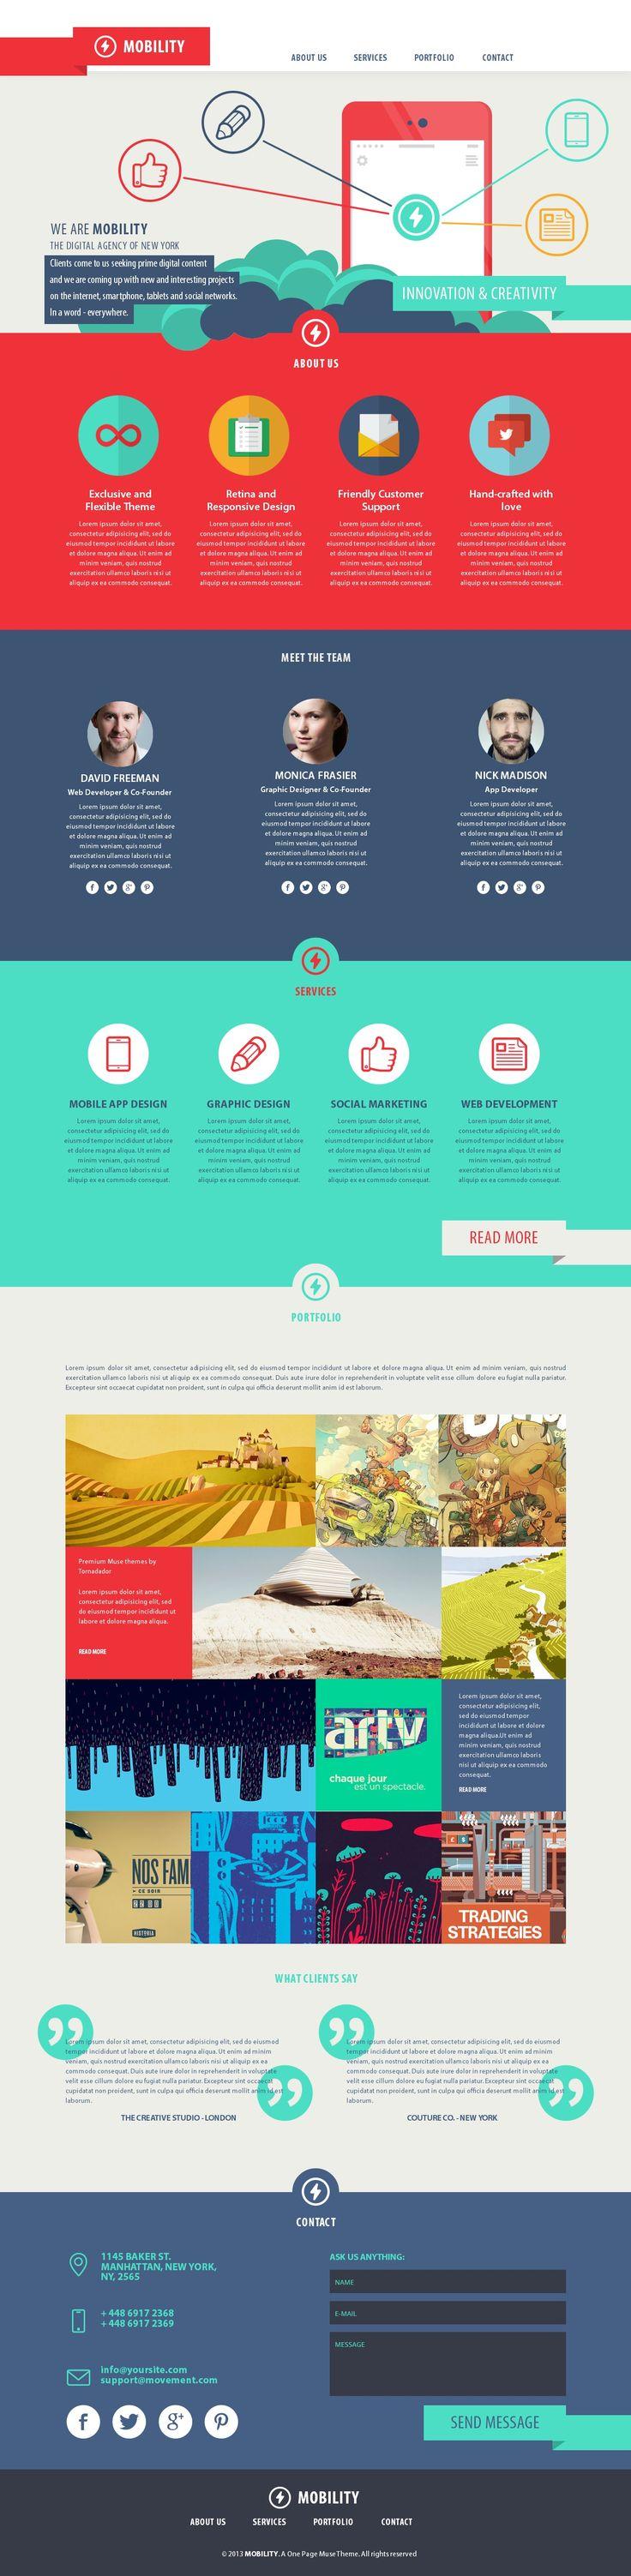 Best 25+ One page website ideas on Pinterest